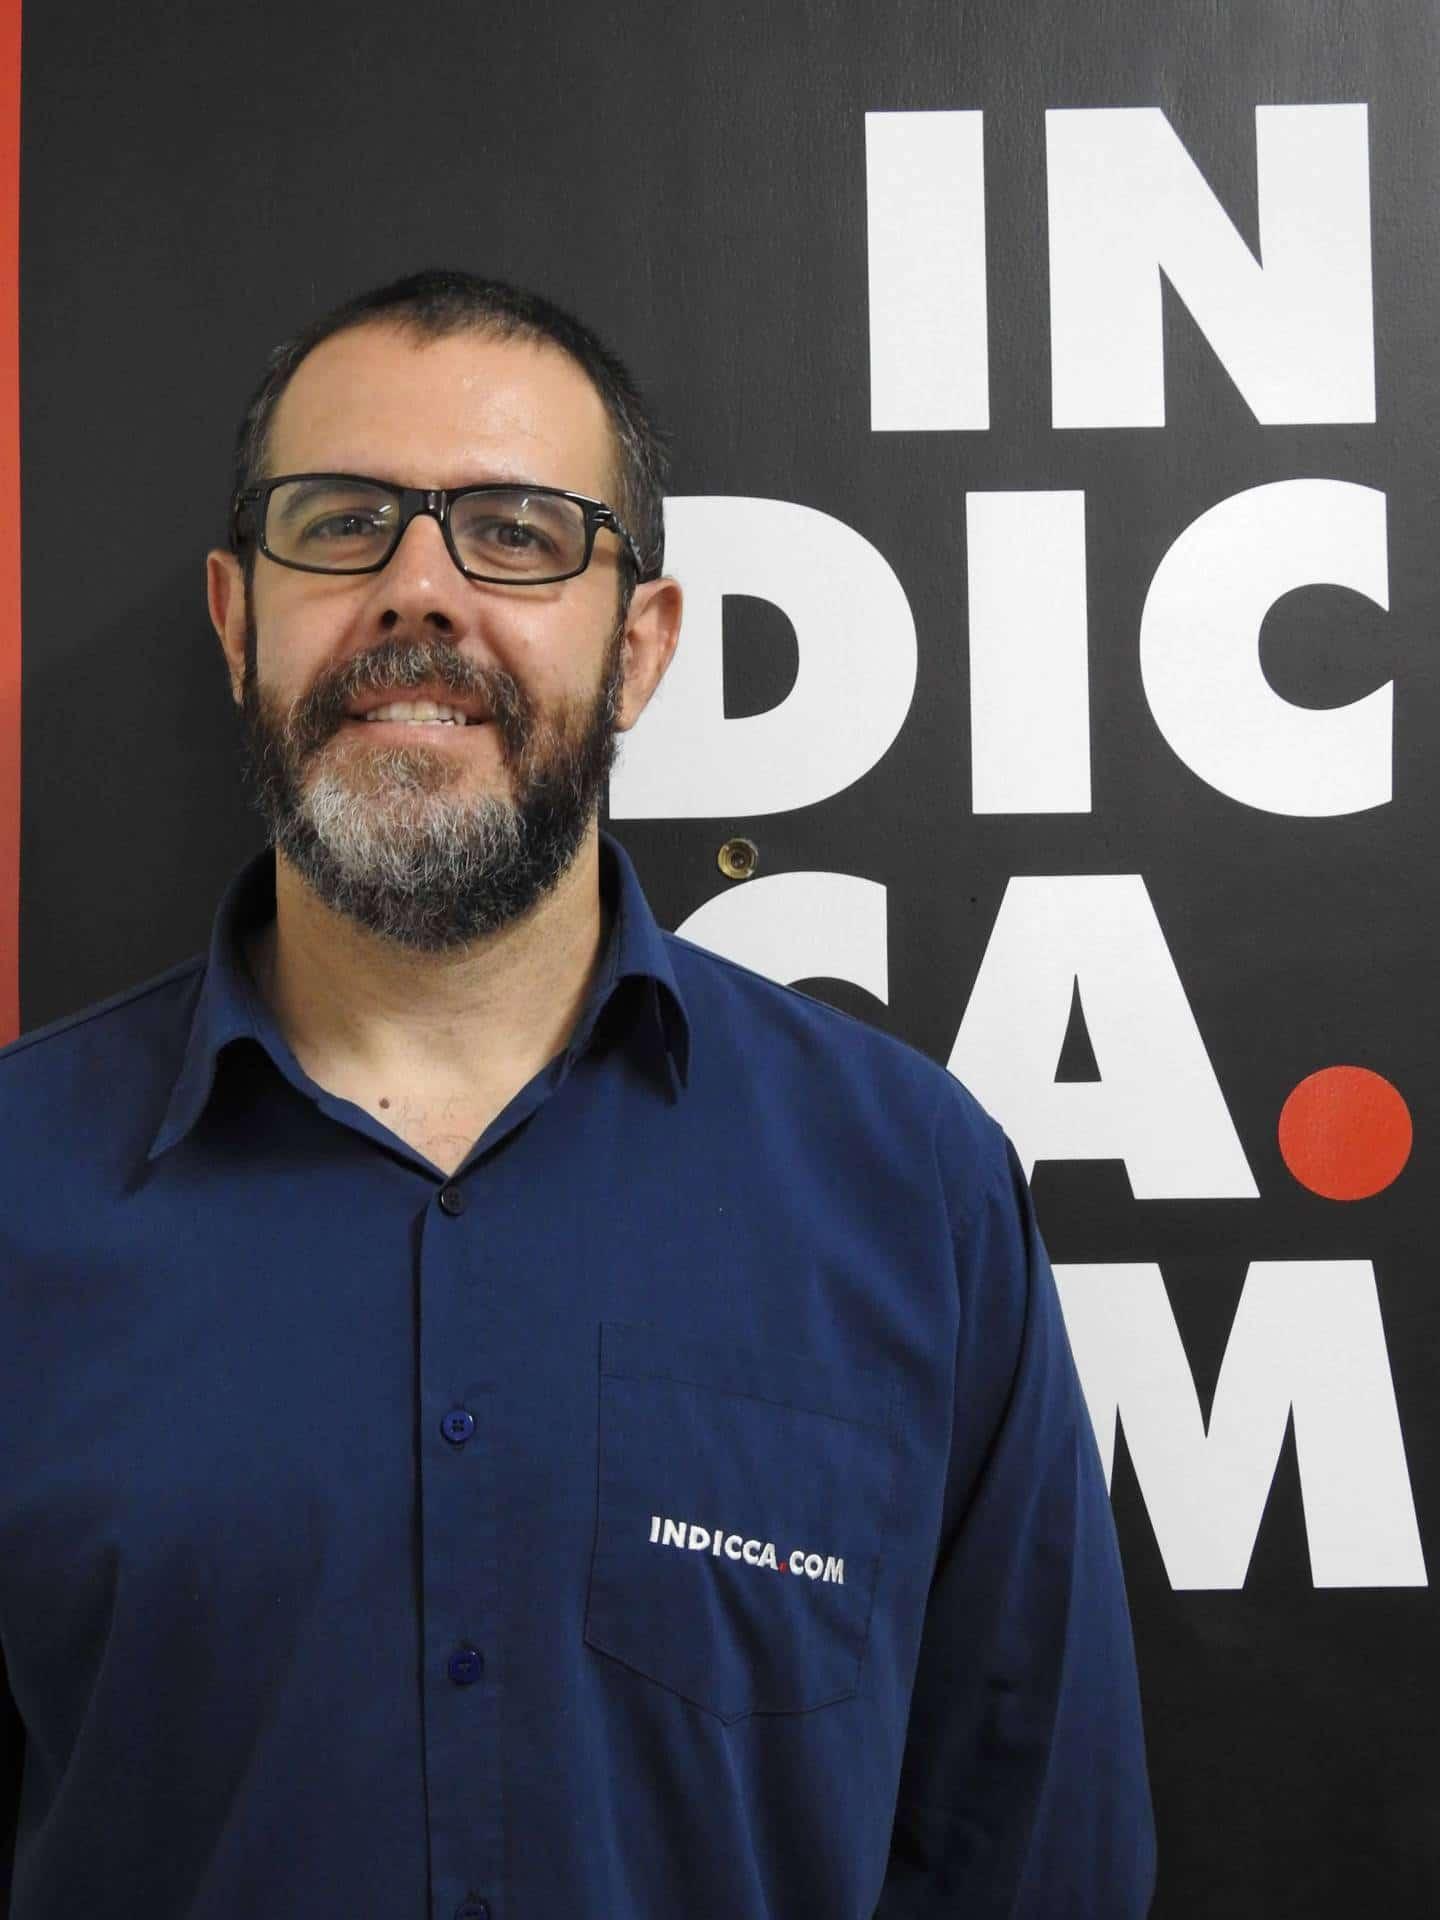 Gustavo-Indicca-2019